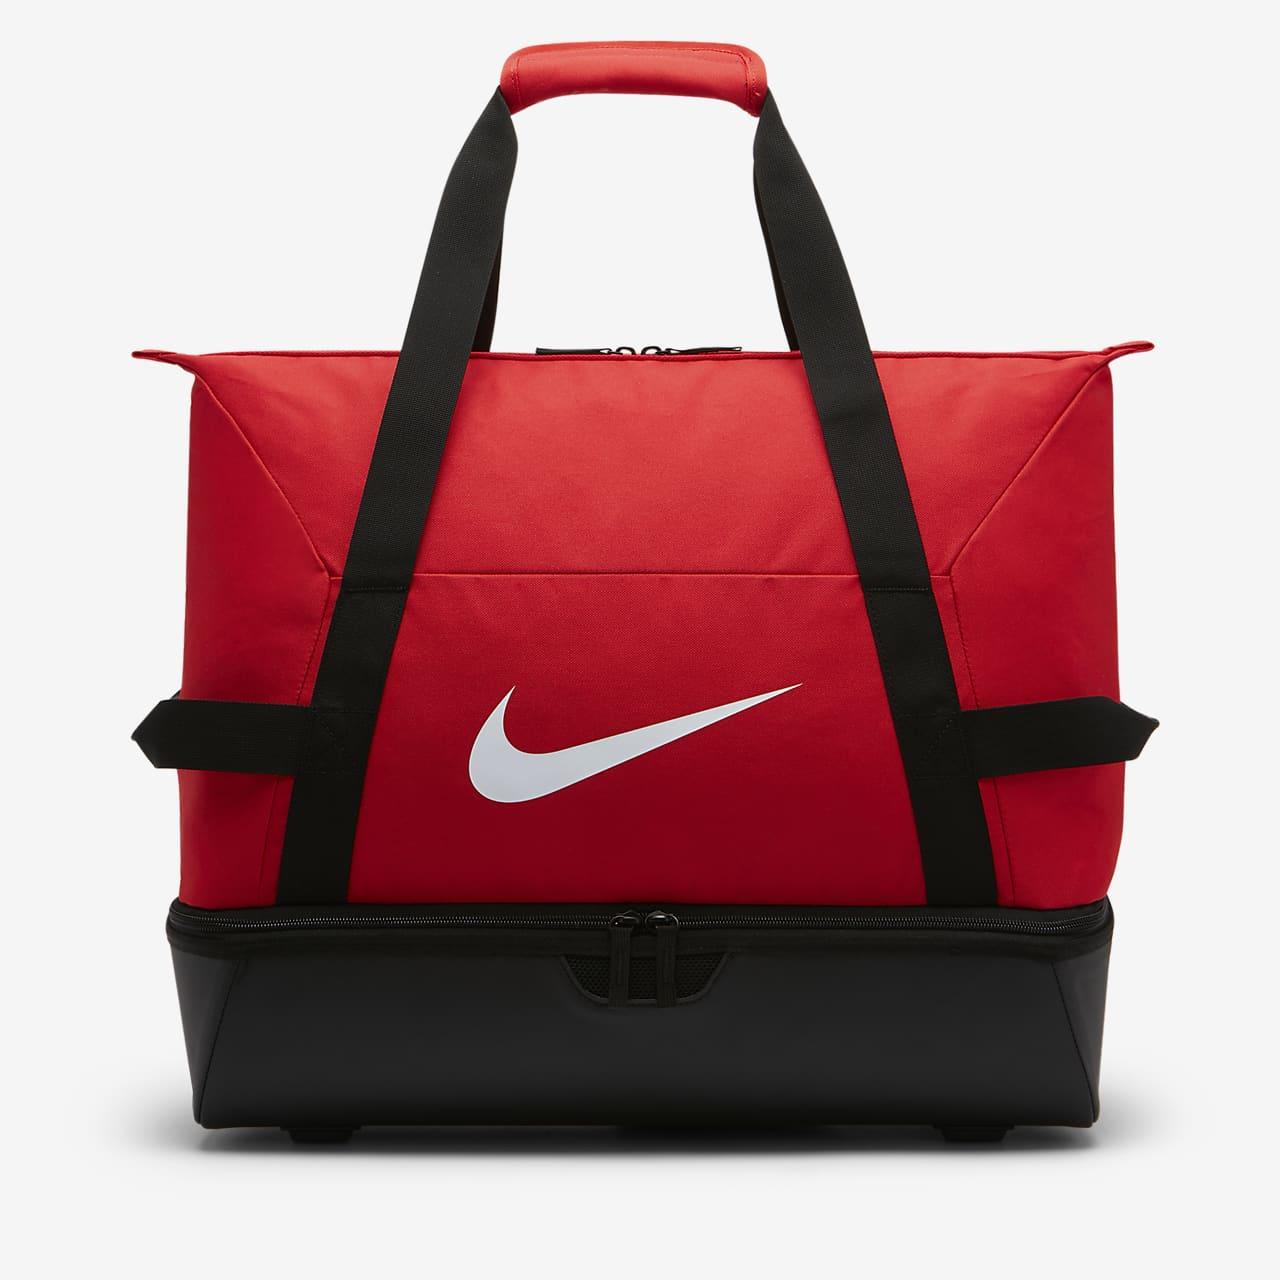 Nike Academy Team Hardcase (Large) Football Duffel Bag